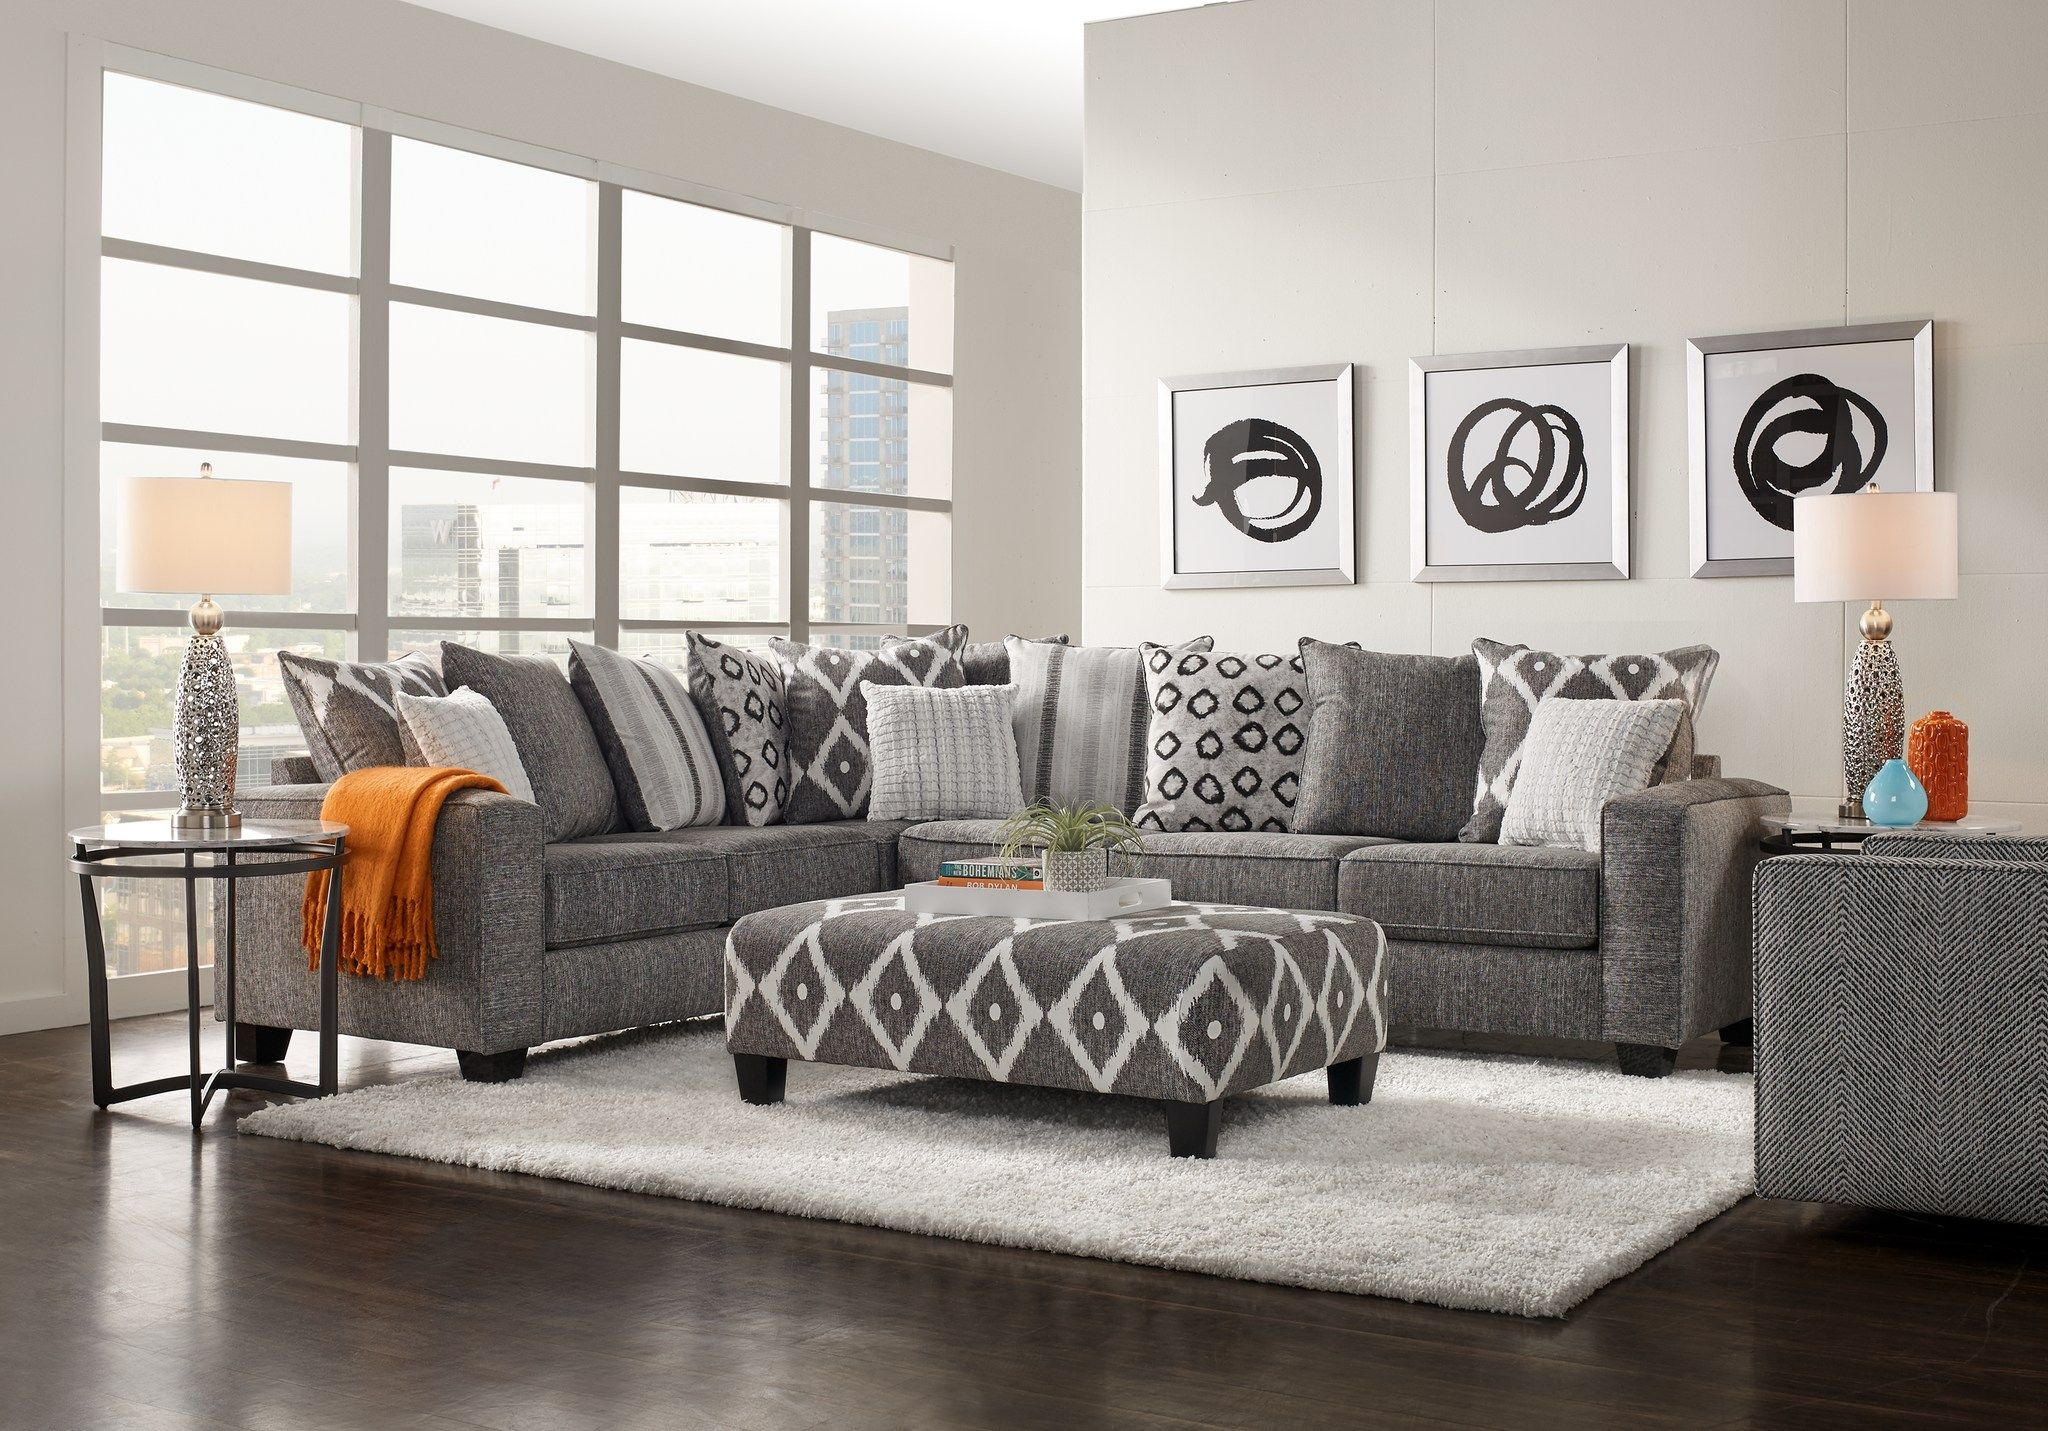 Sectional Living Room Sets, Living Room Suites